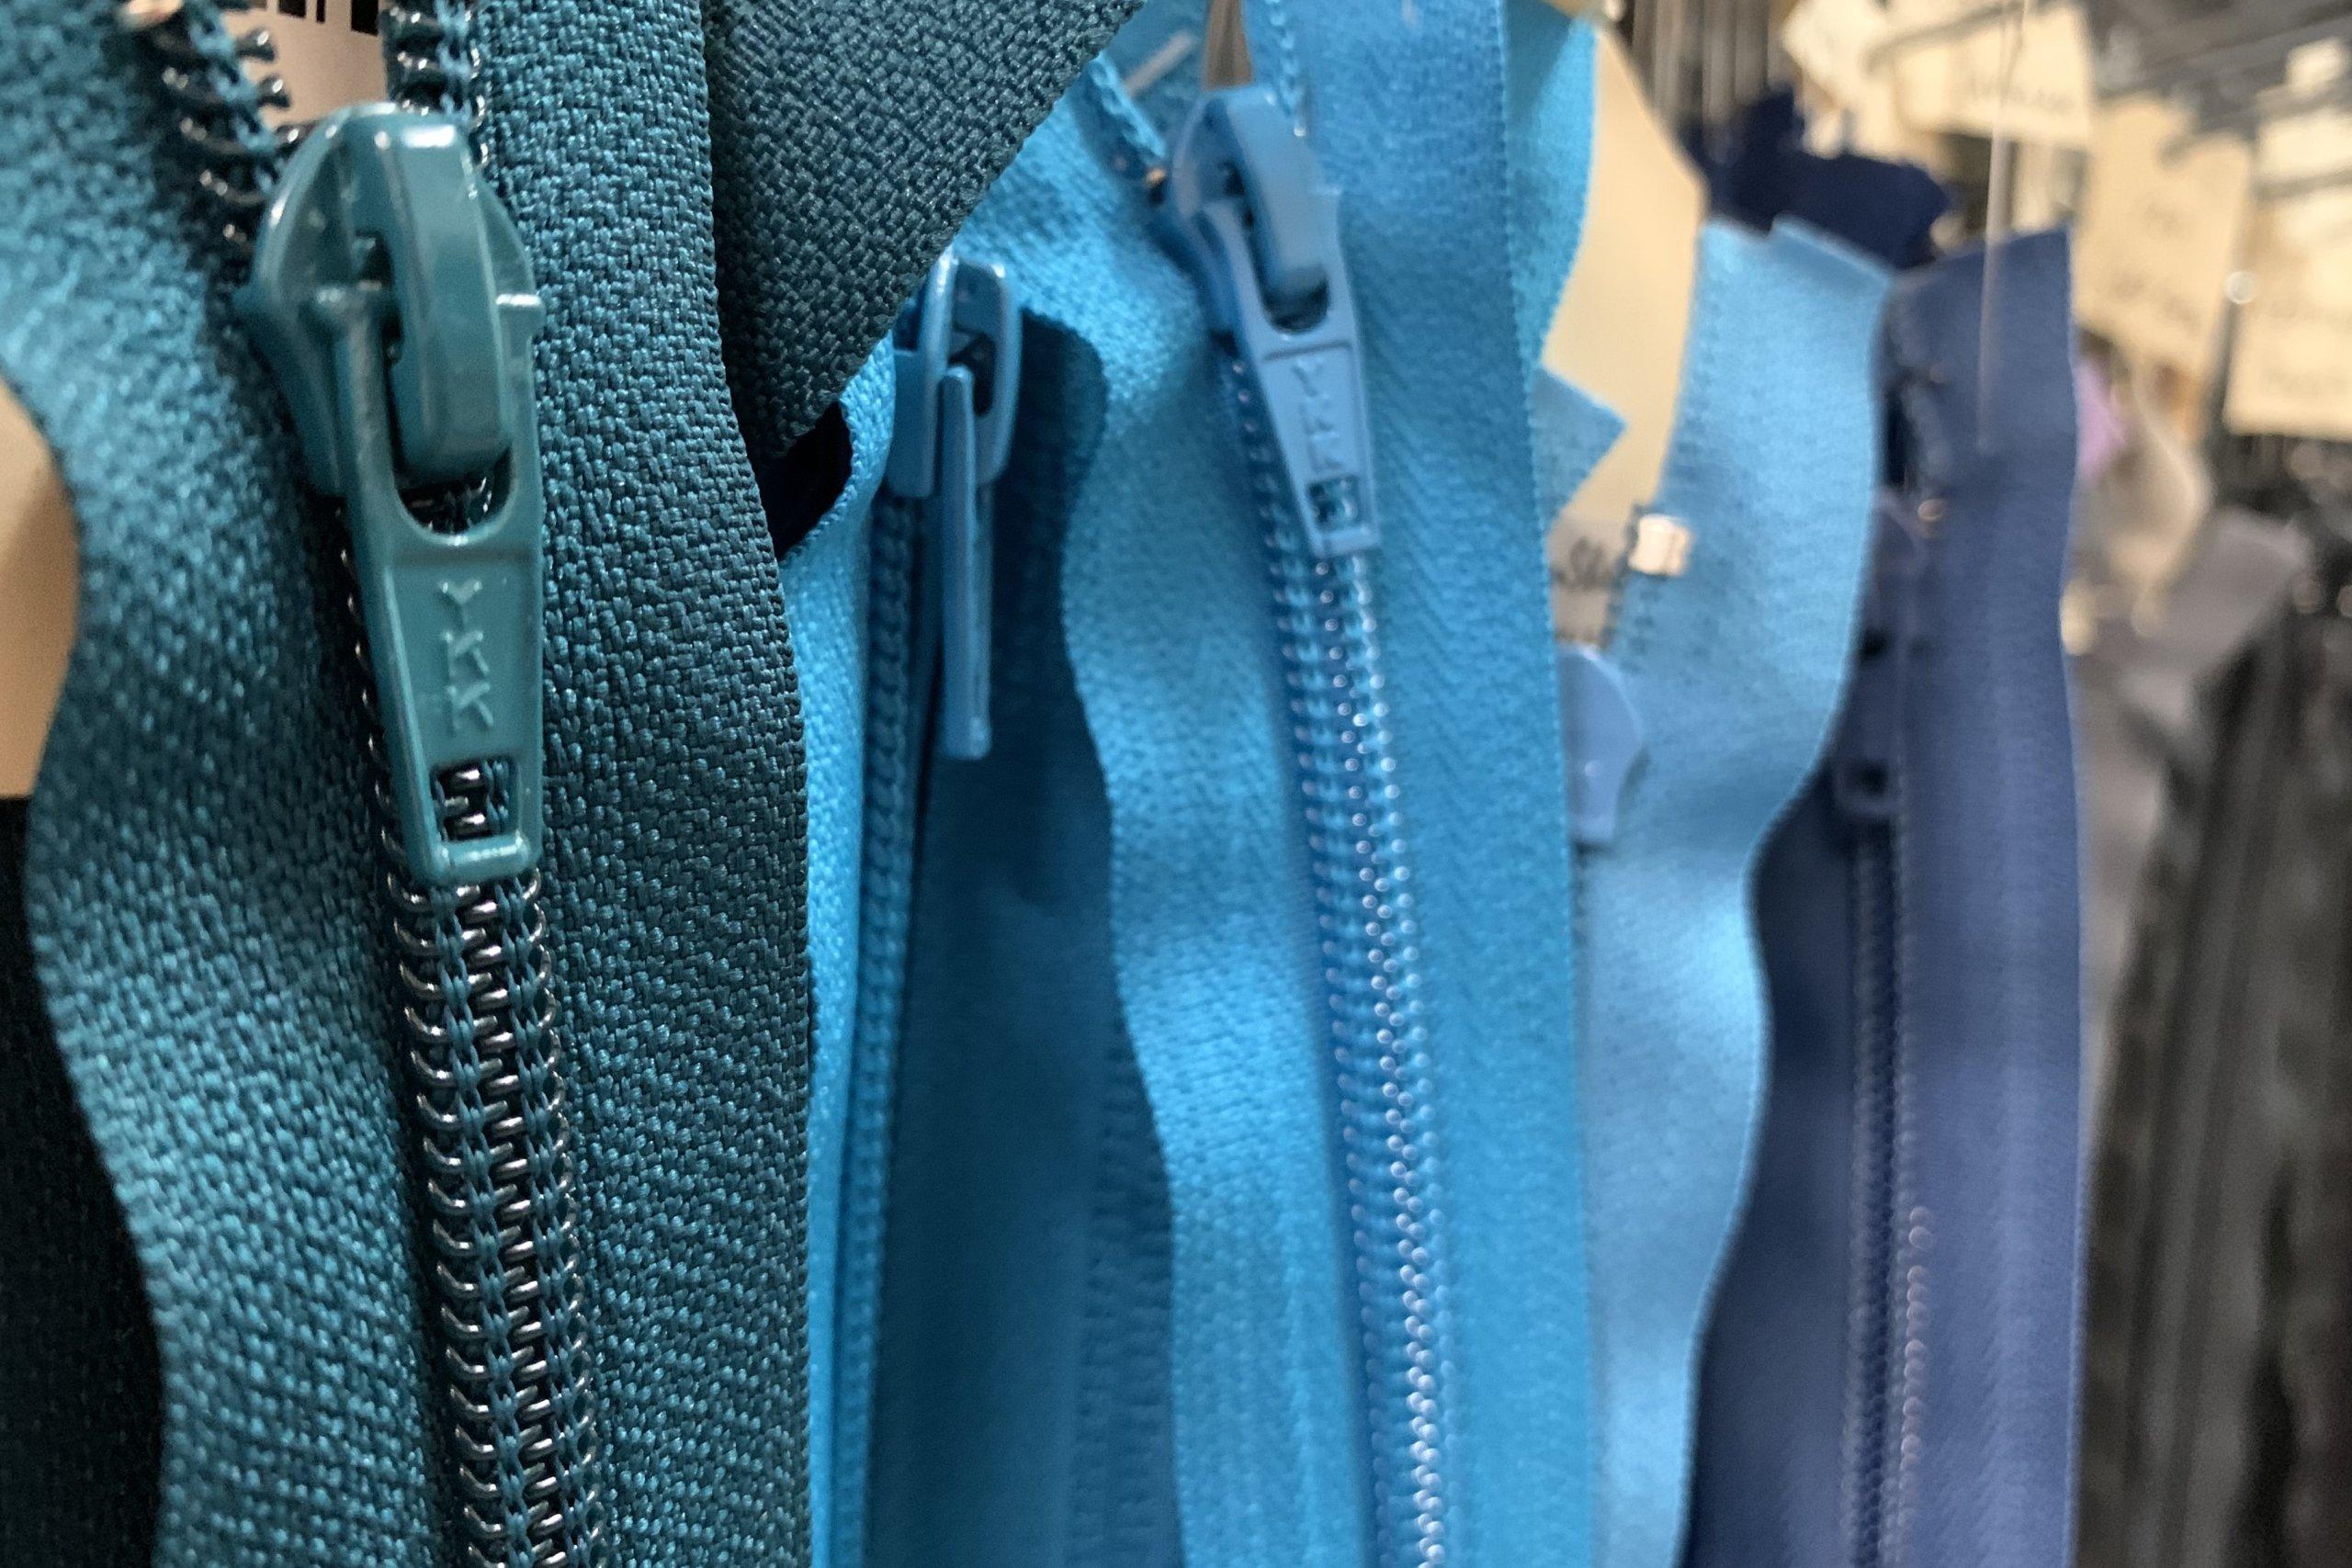 zipper inventory